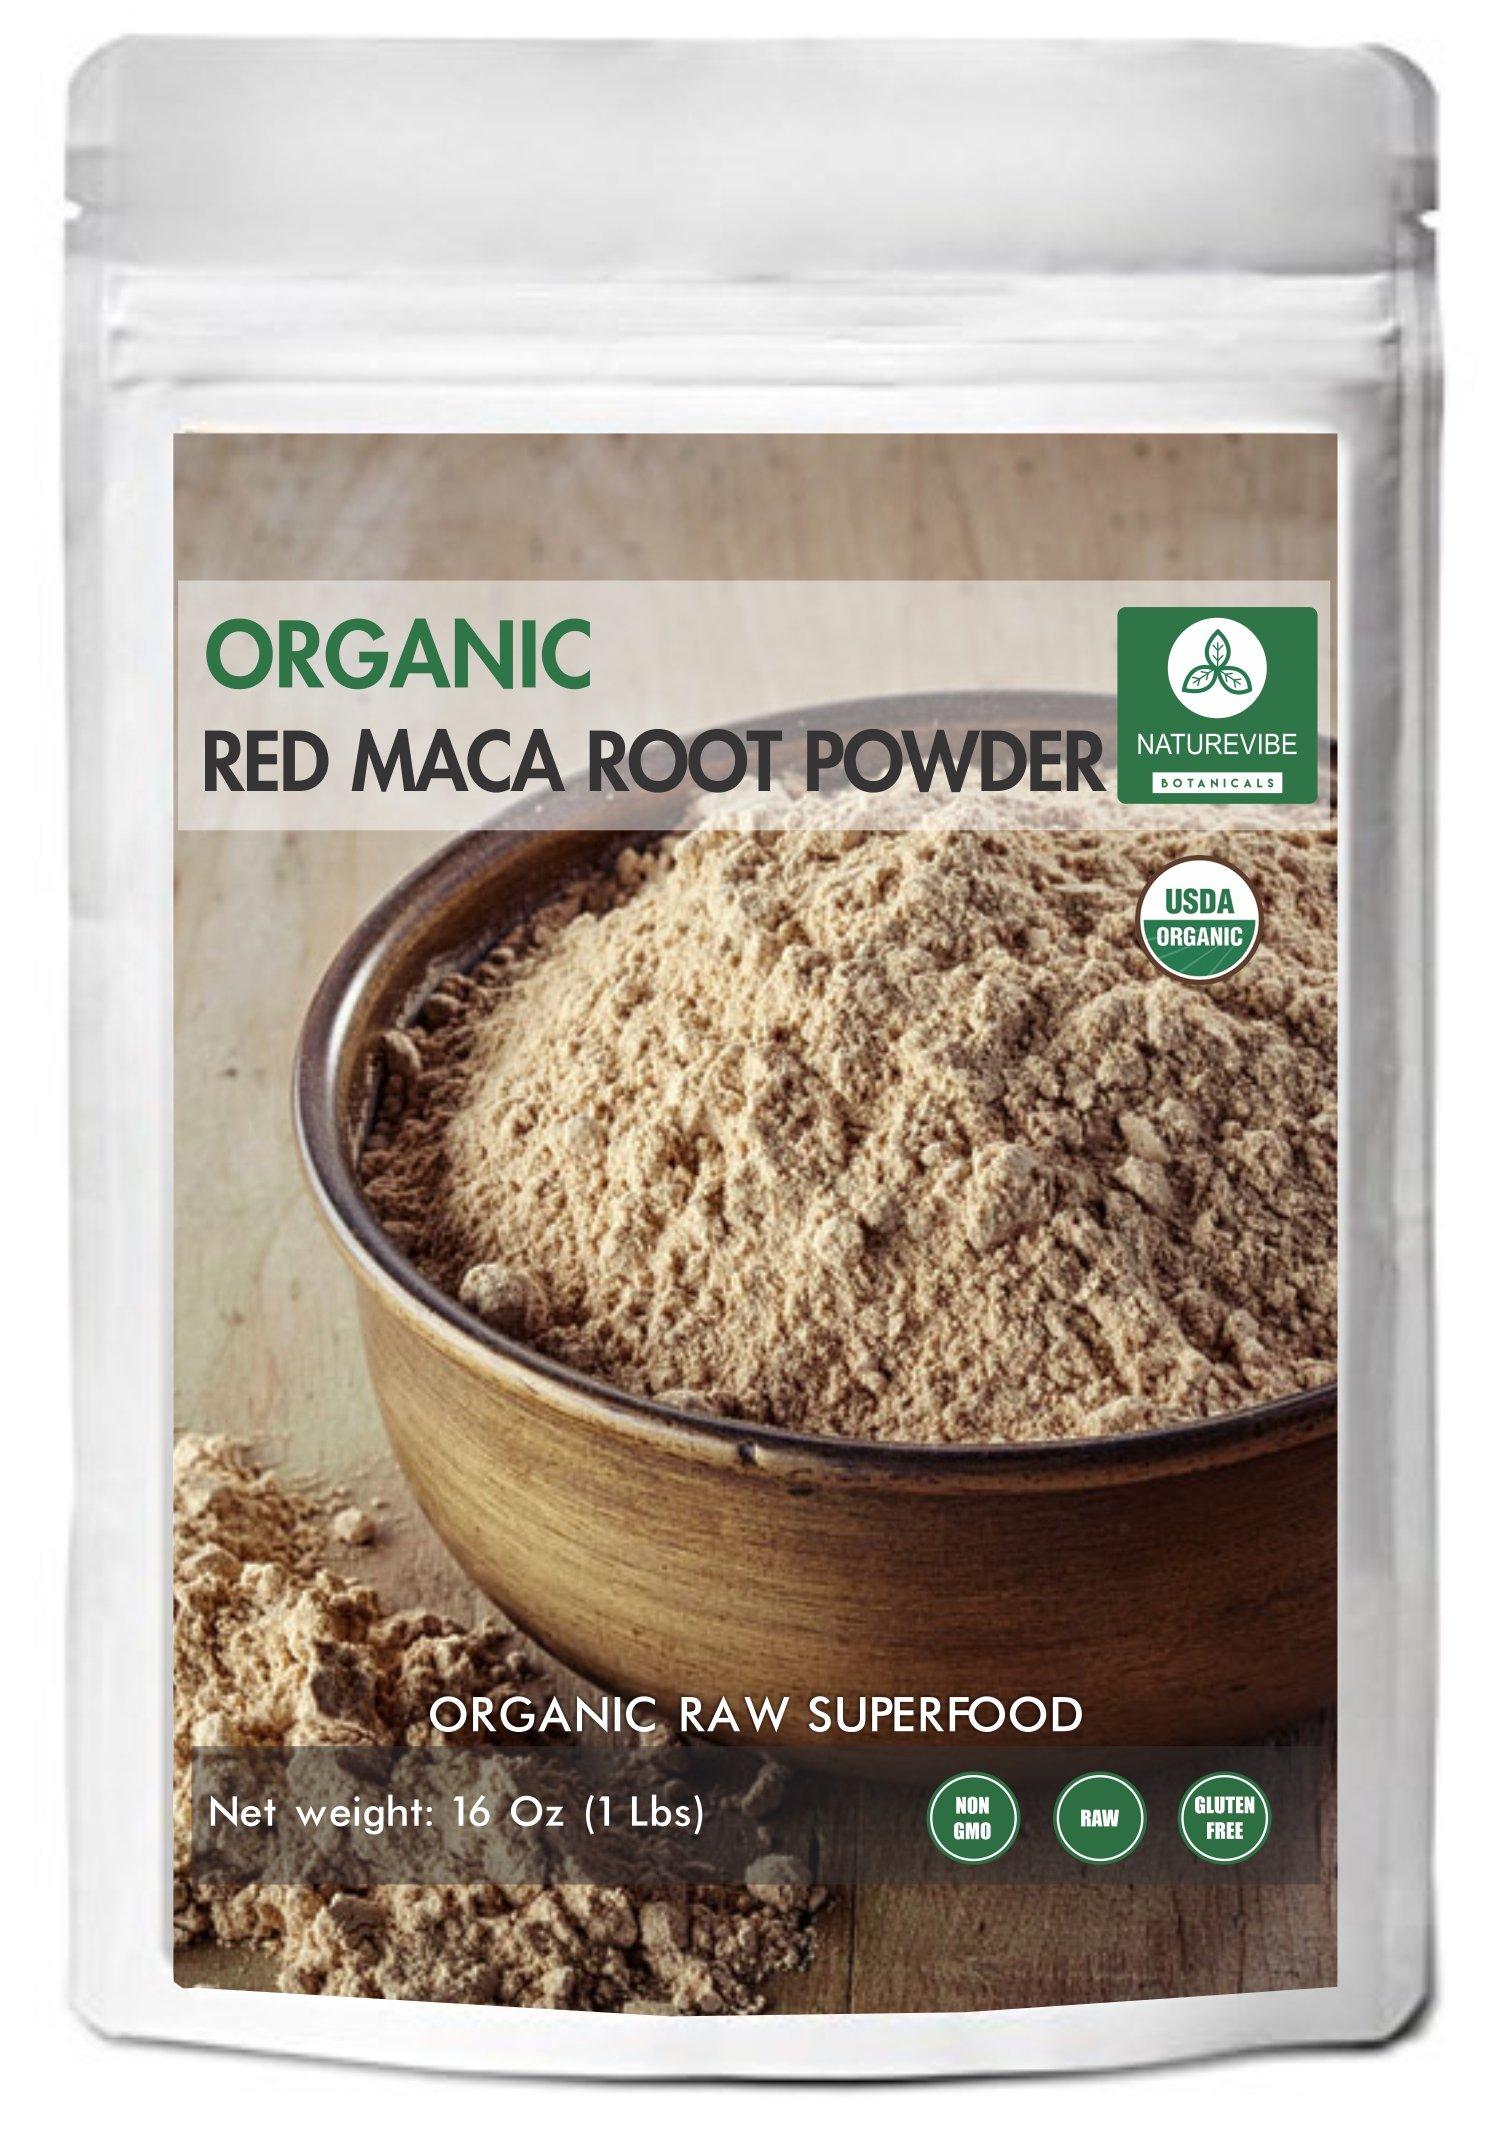 Naturevibe Botanicals USDA Organic Red Maca Powder (1lb) - Gluten-Free & Non-GMO (16 ounces) | Balance Hormone Level |Improves Stamina, Mood and Memory